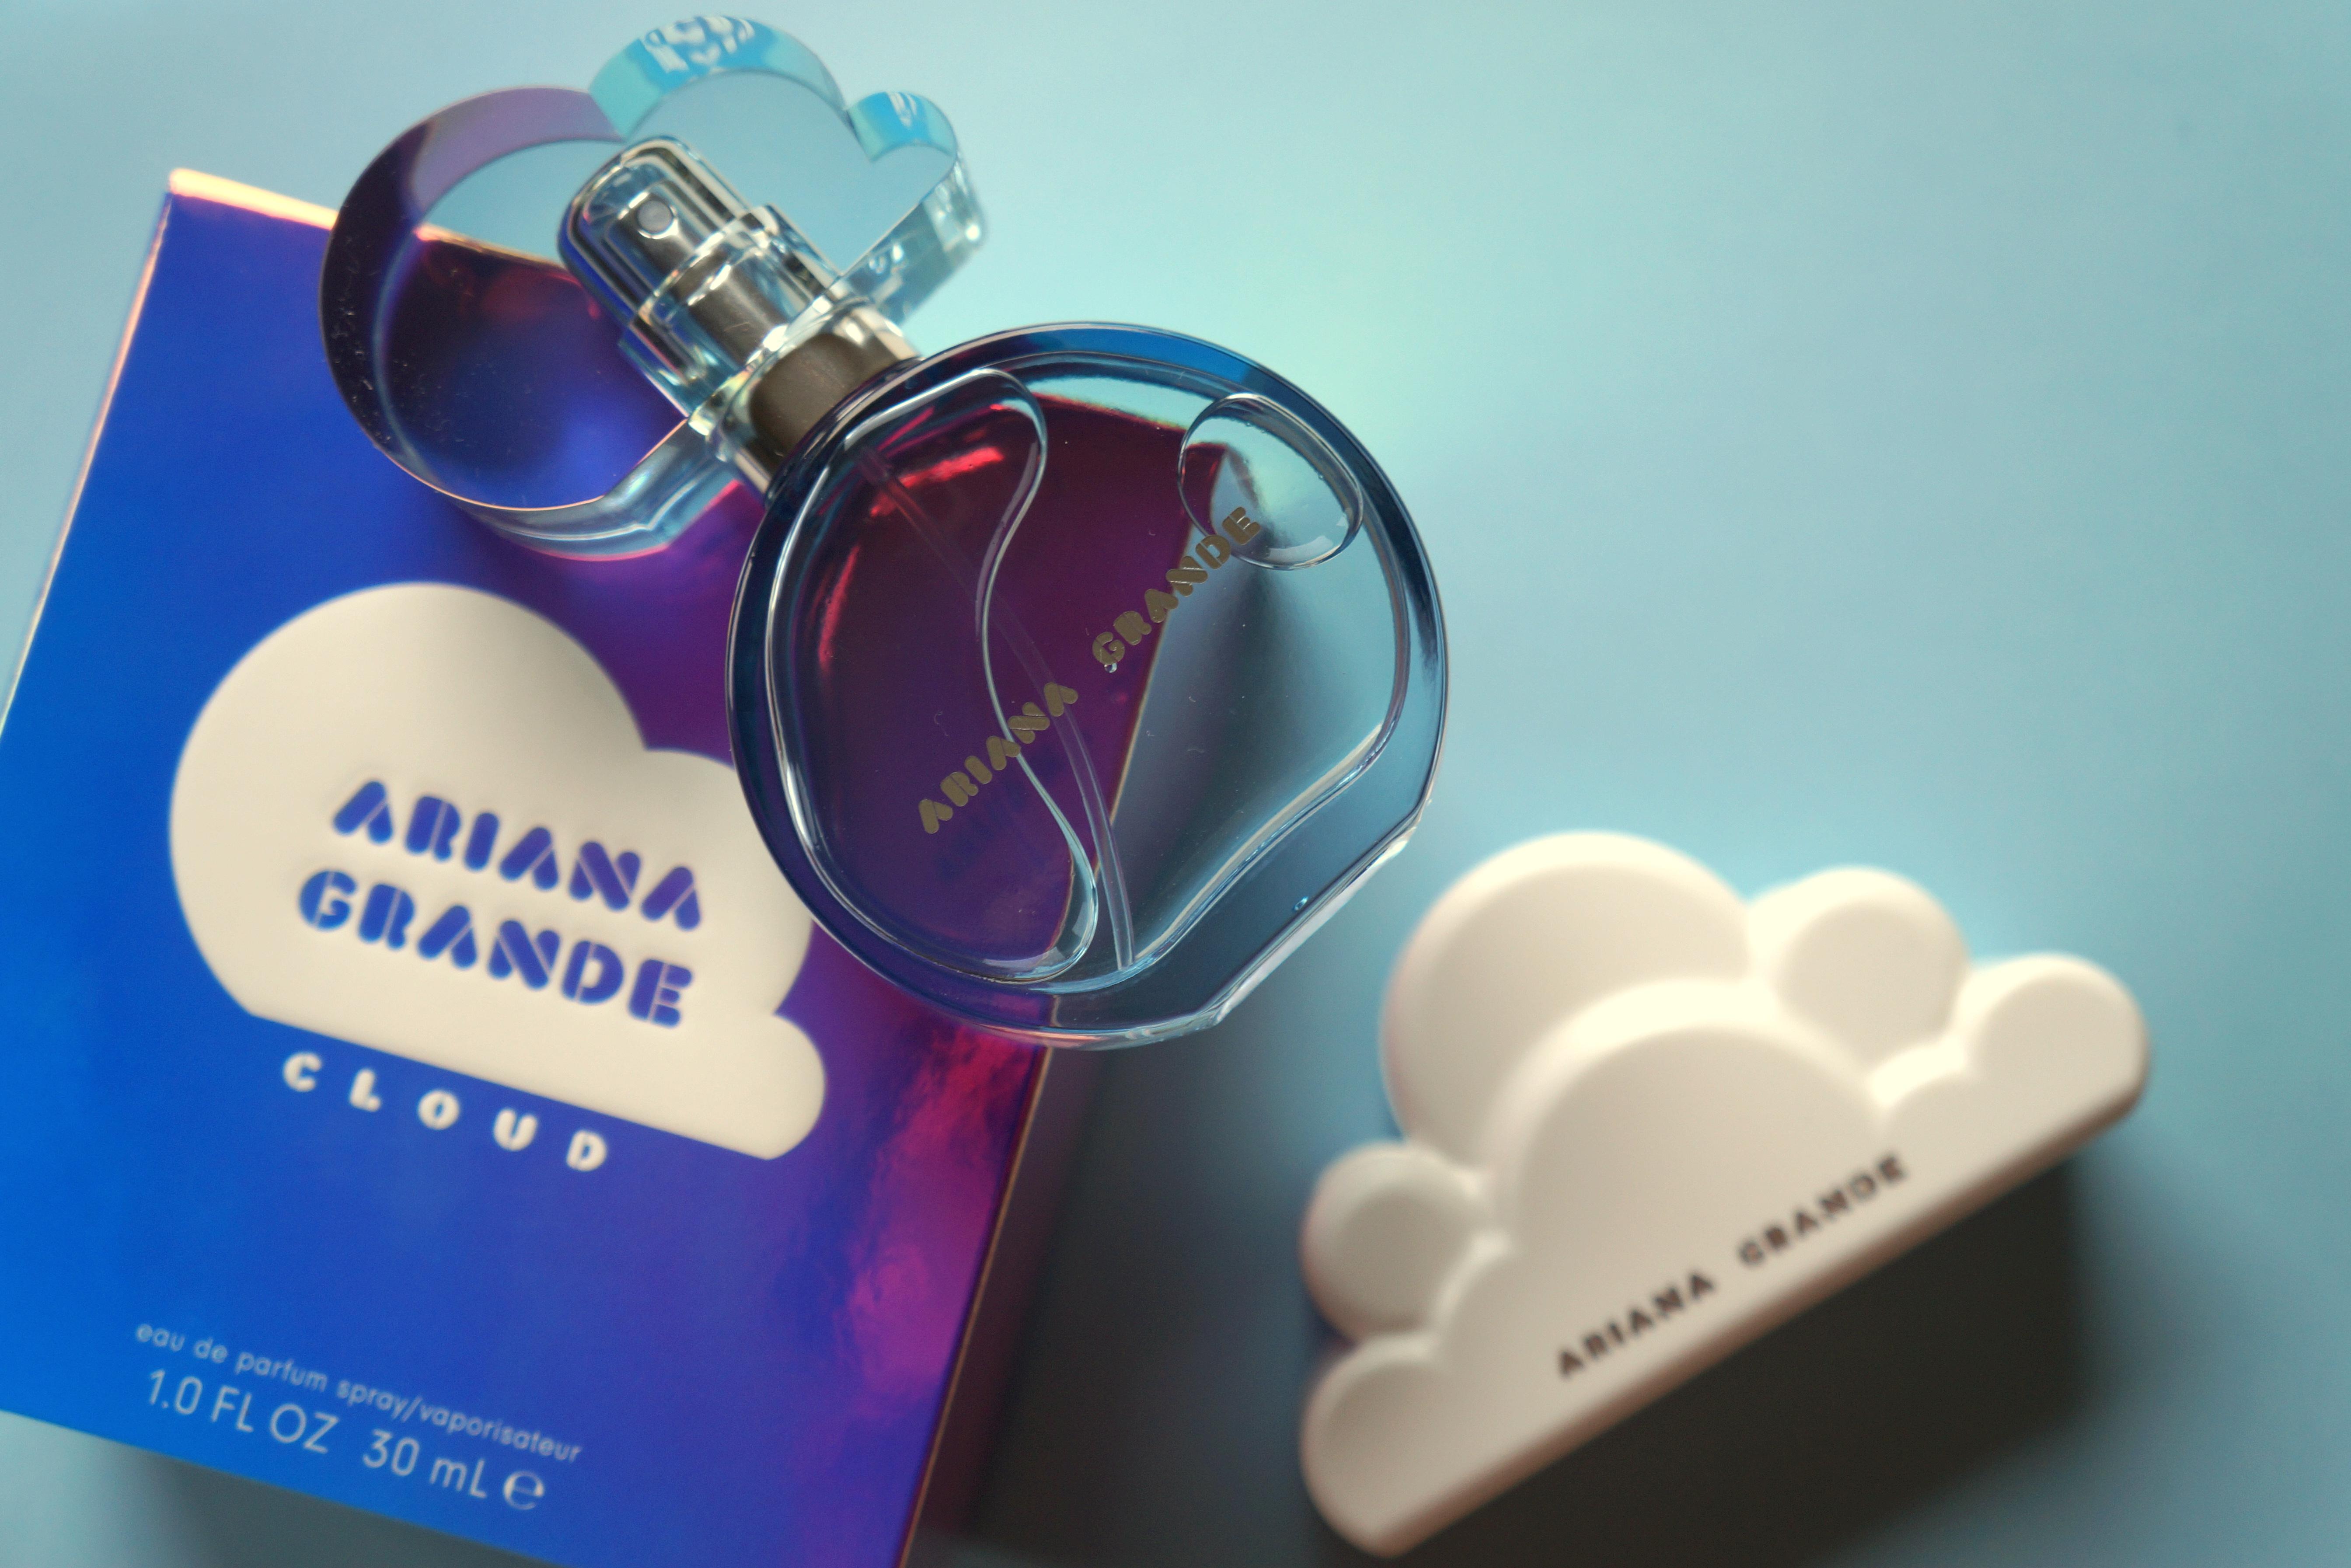 ariana_grande_cloud_perfumy_01